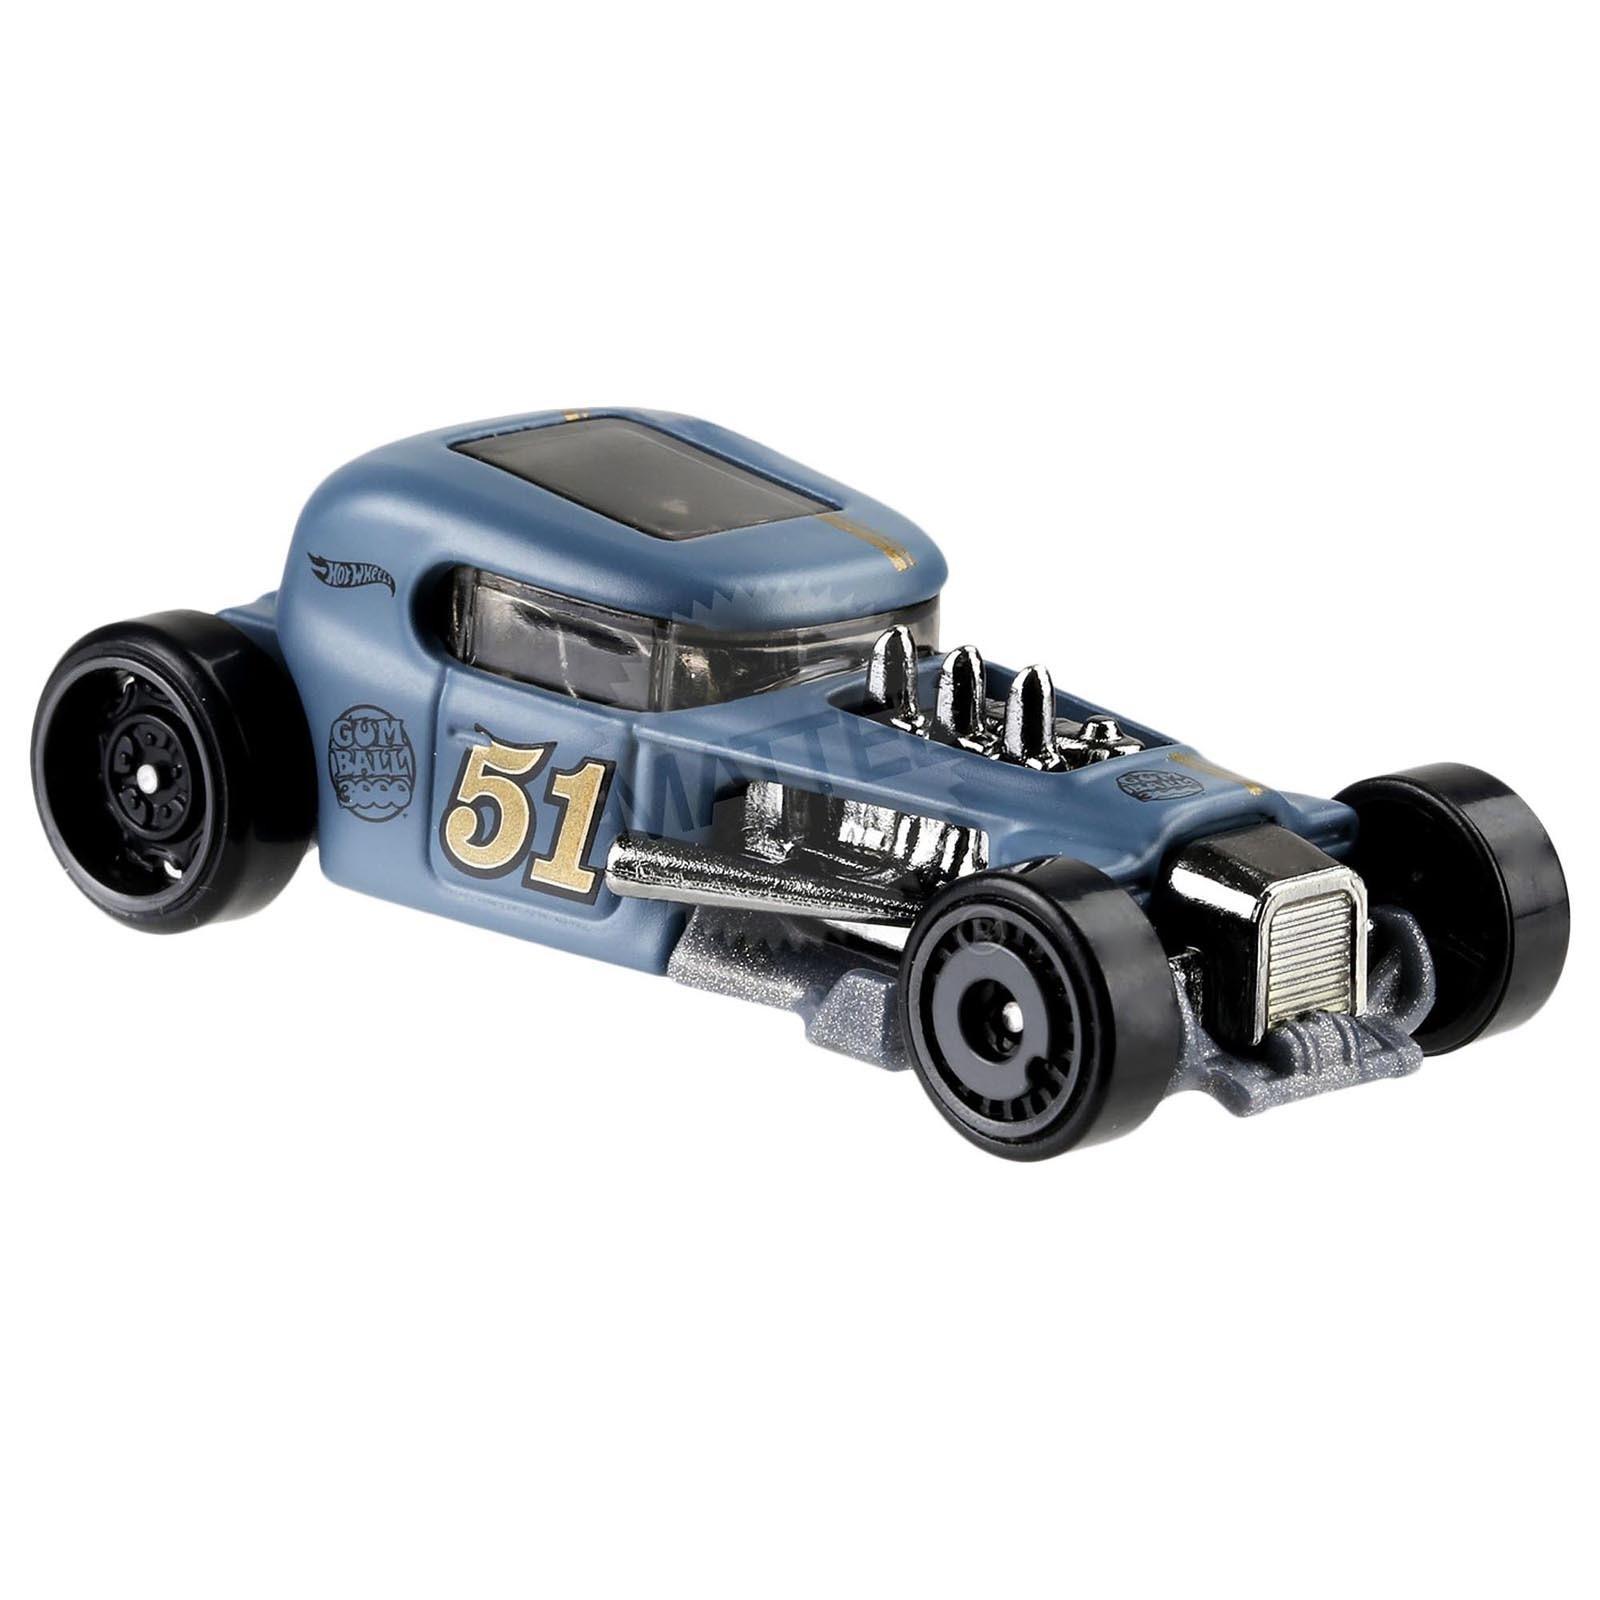 Hot Wheels - Mod Rod - Gumball 3000 Rally - FYB61